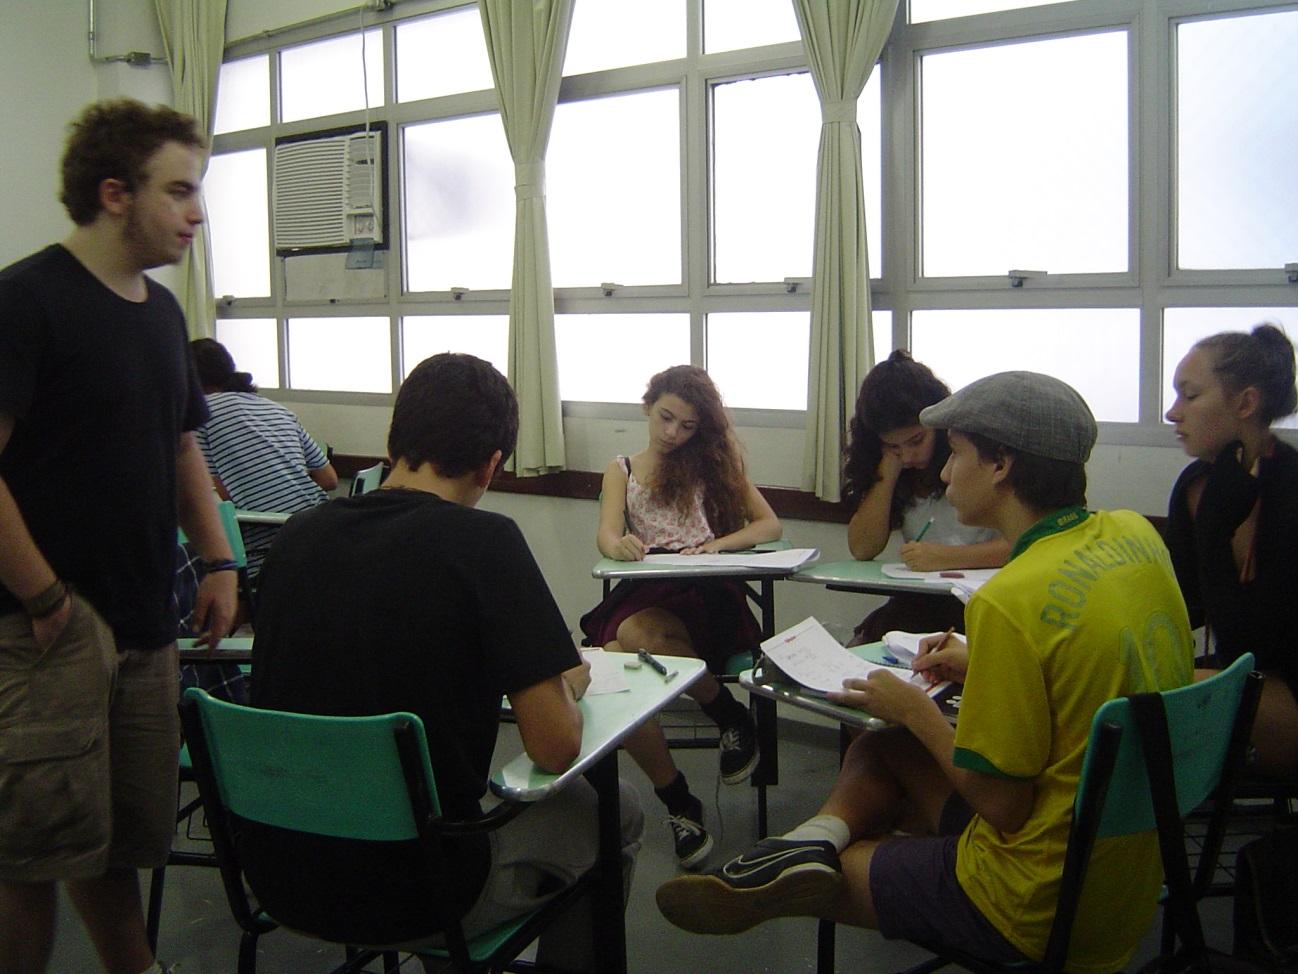 orientacoes_de_estudo_de_matematica_no_curriculo_da_1_serie_005